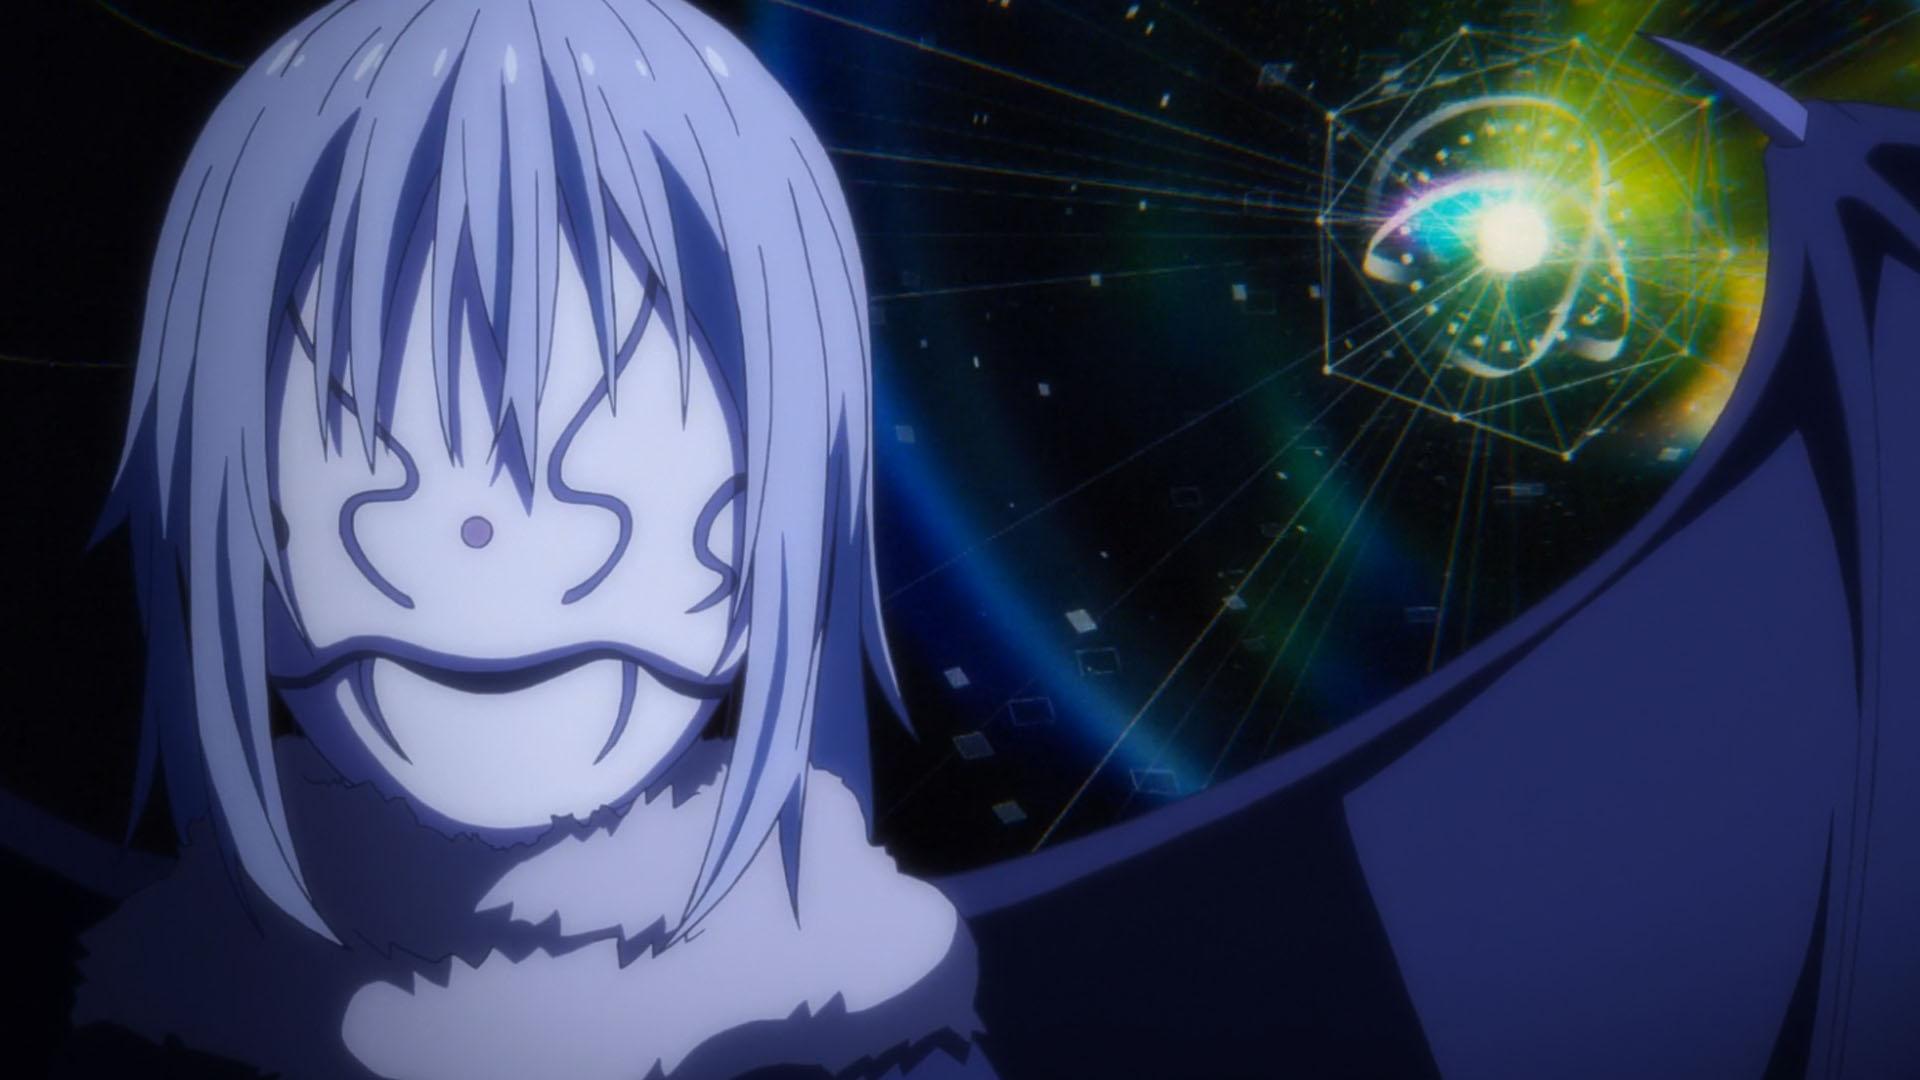 Tensei Shitara Slime Datta Ken 14 Random Curiosity